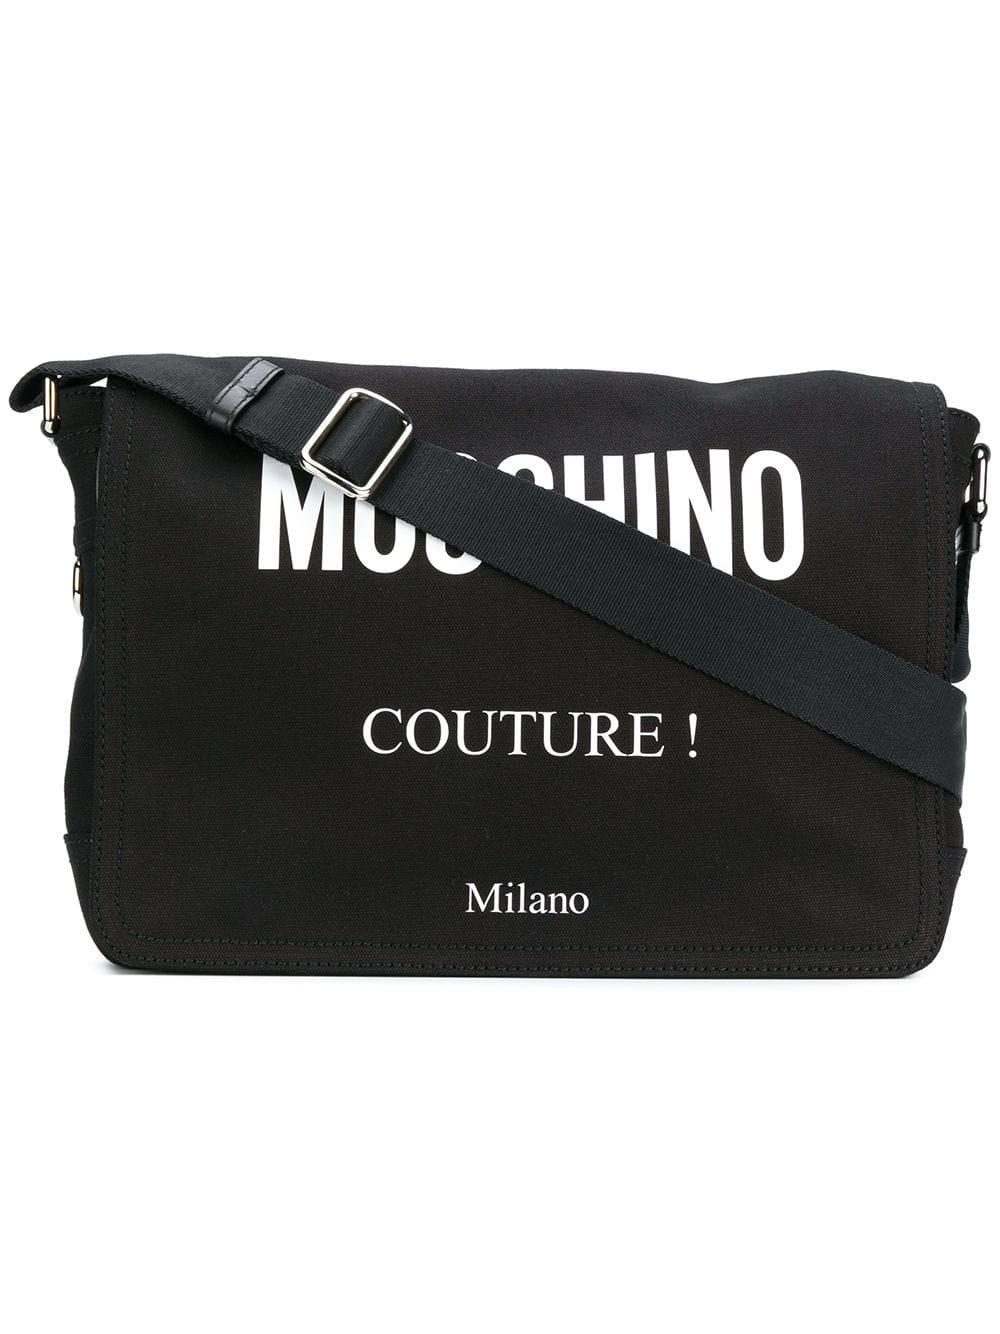 094a1215b247 Lyst - Moschino Logo Printed Crossbody Bag in Black for Men